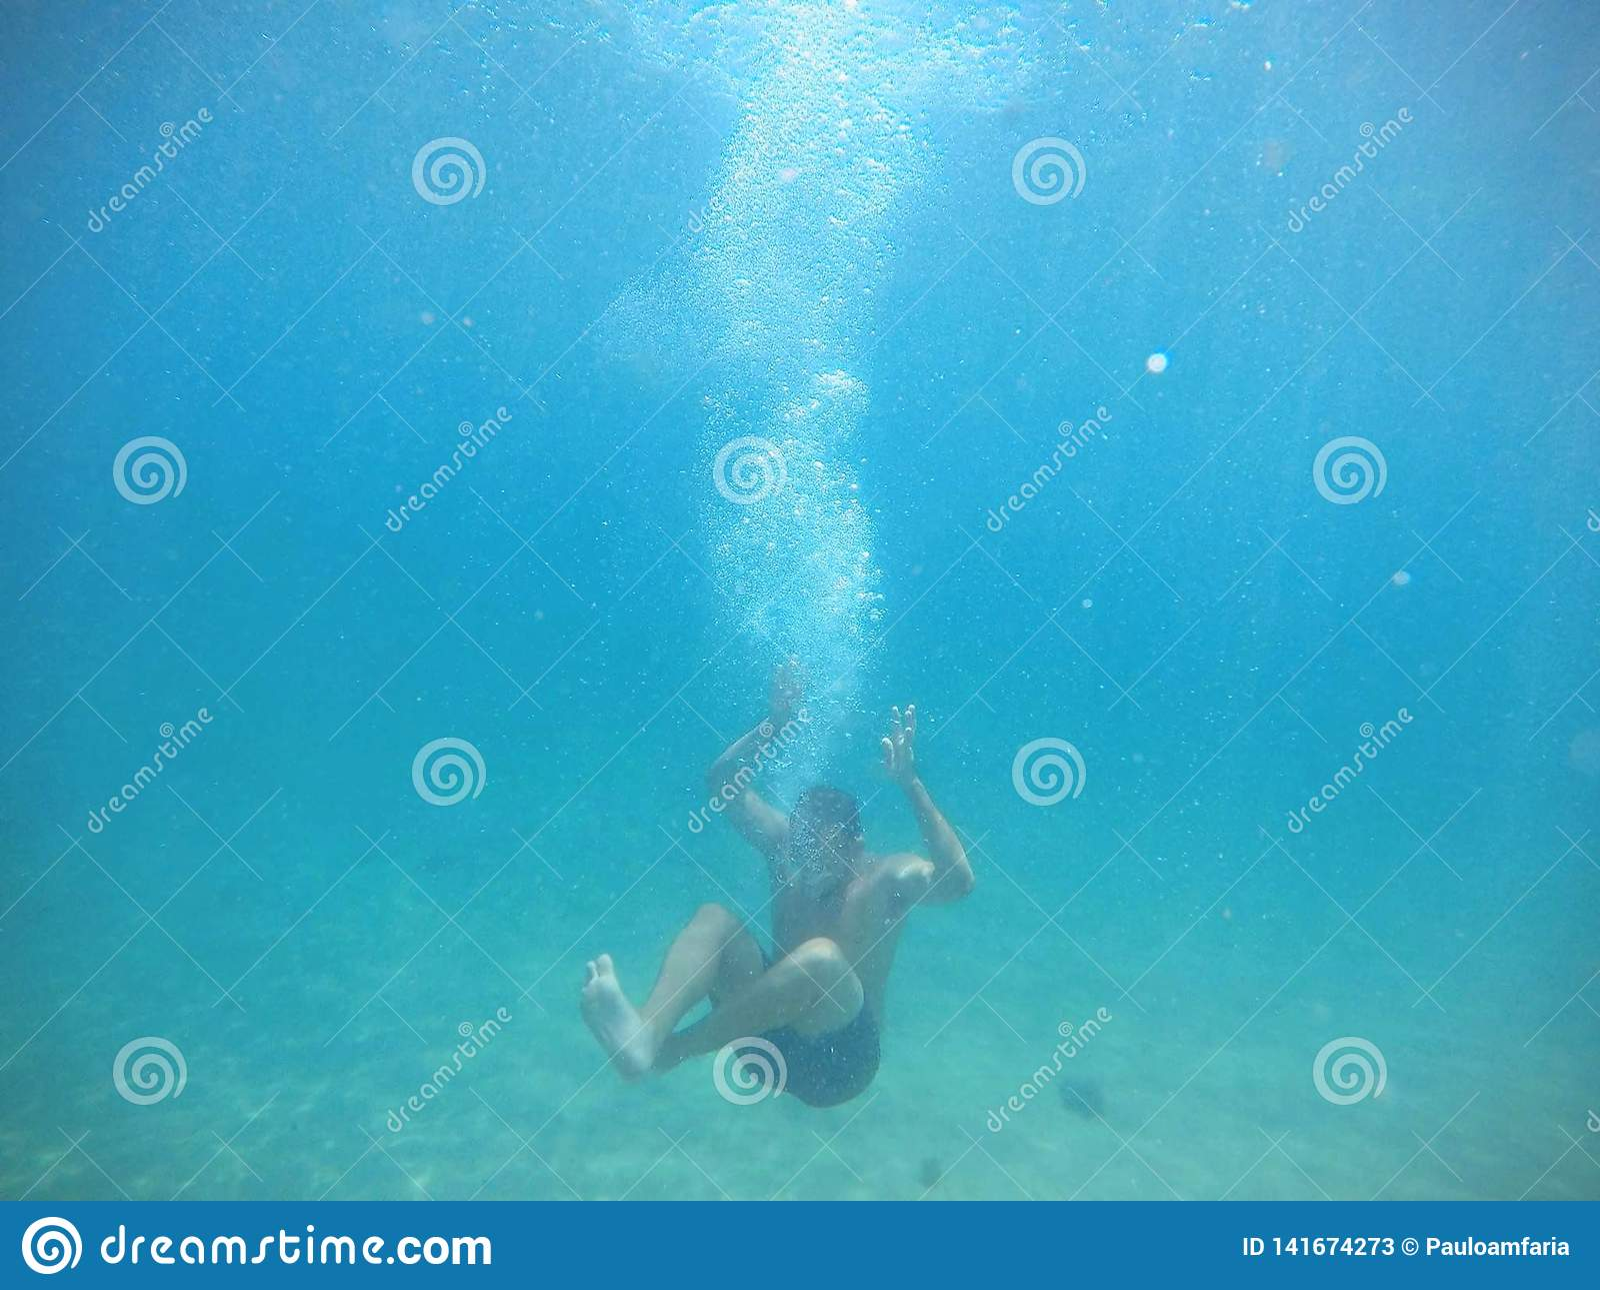 Sinking body